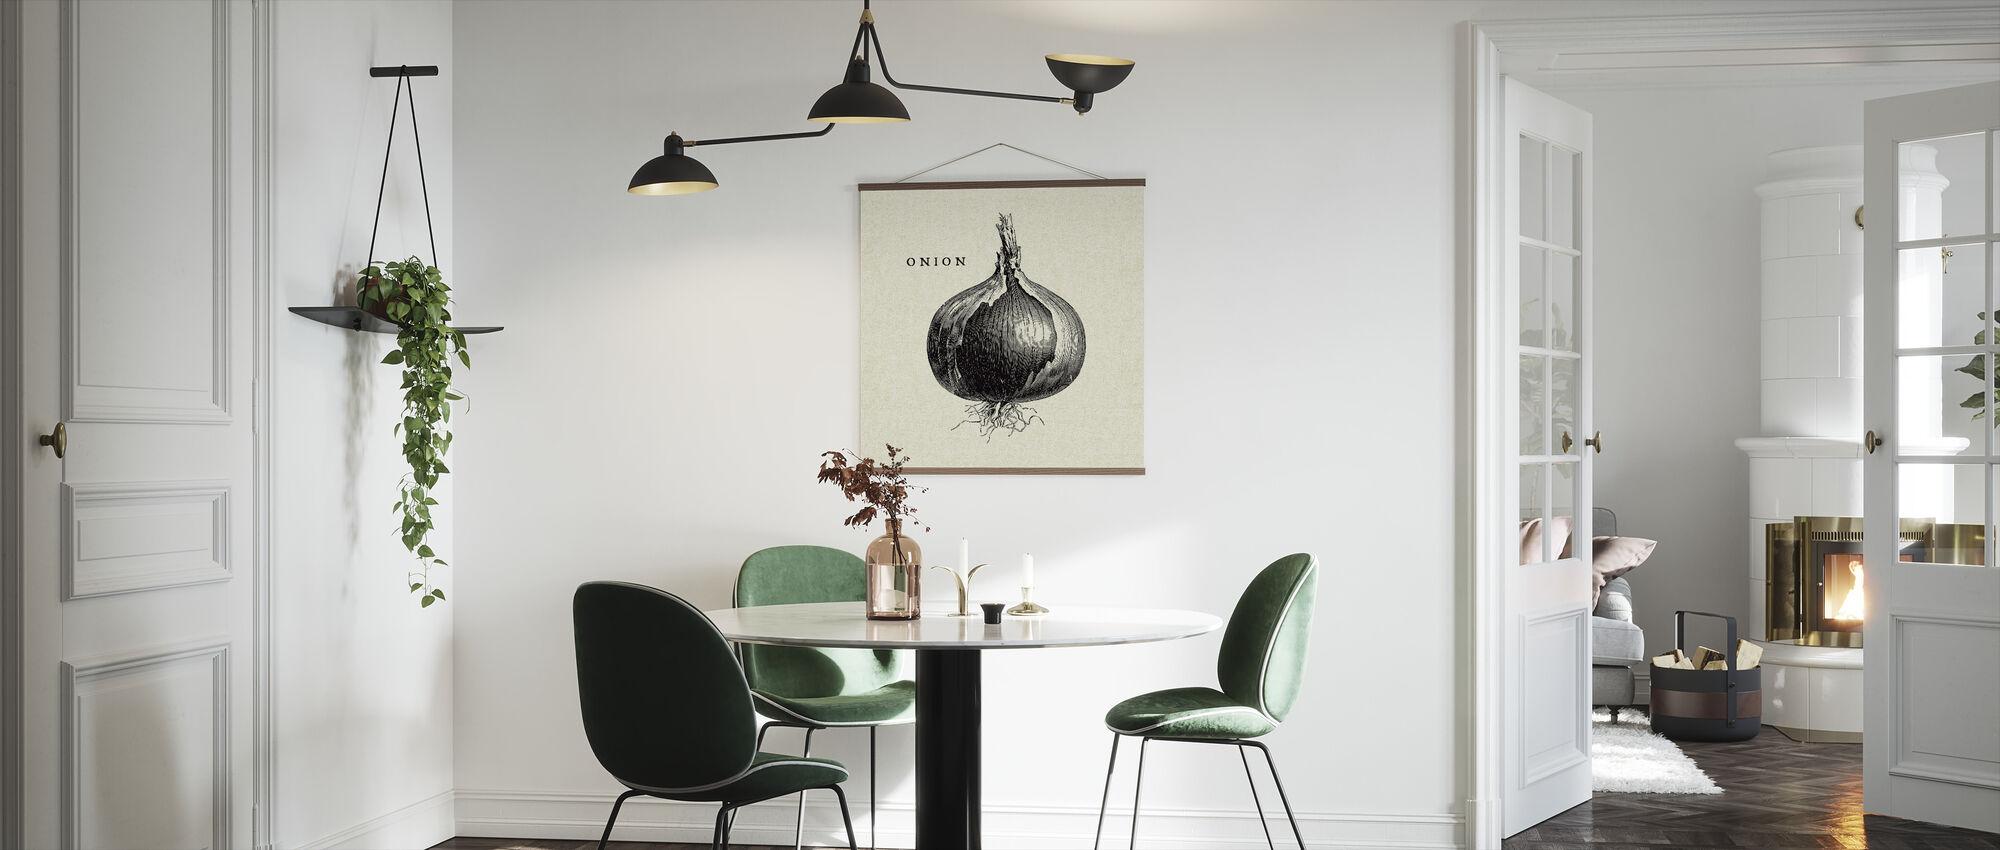 Keuken Illustratie - Ui - Poster - Keuken